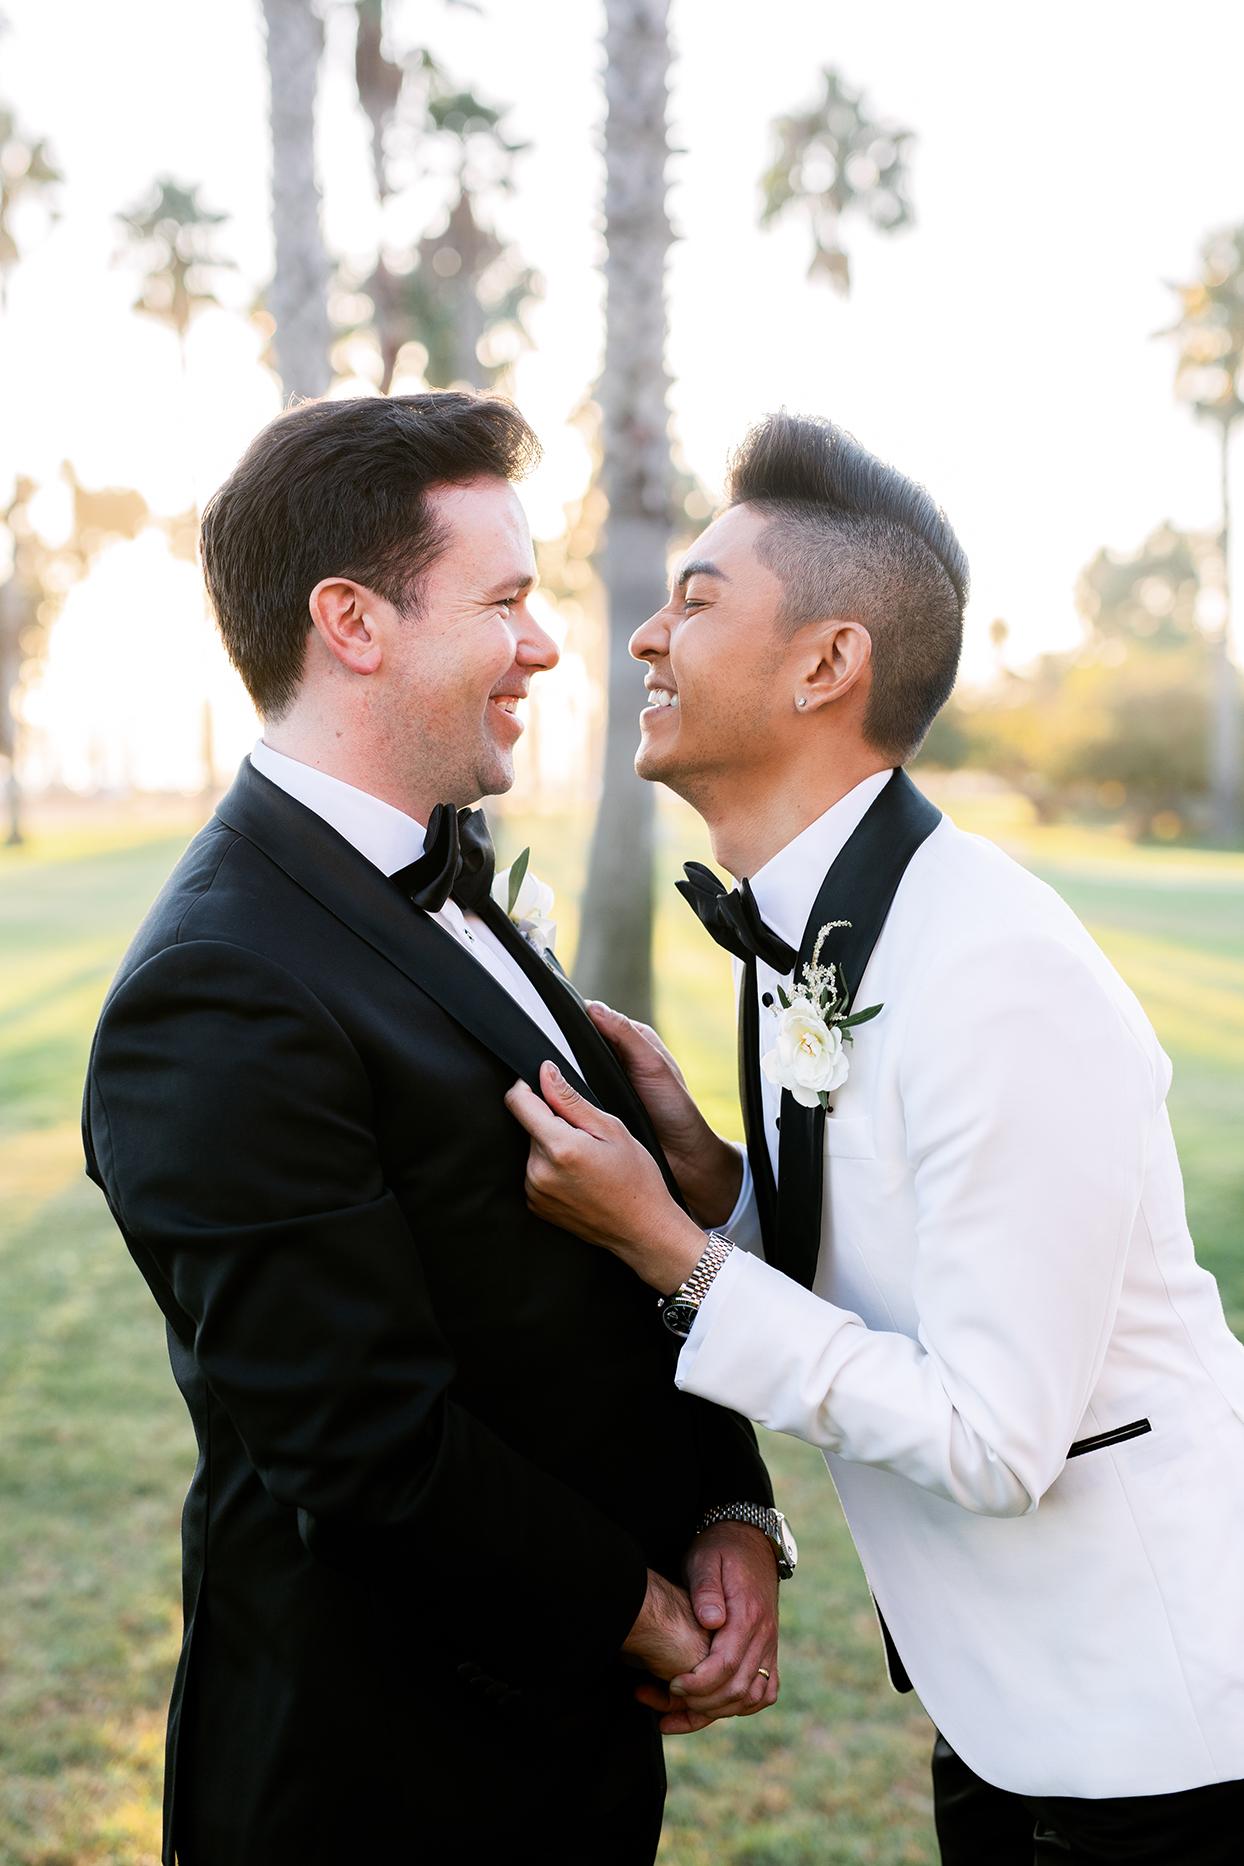 jason justing wedding couple laughing together